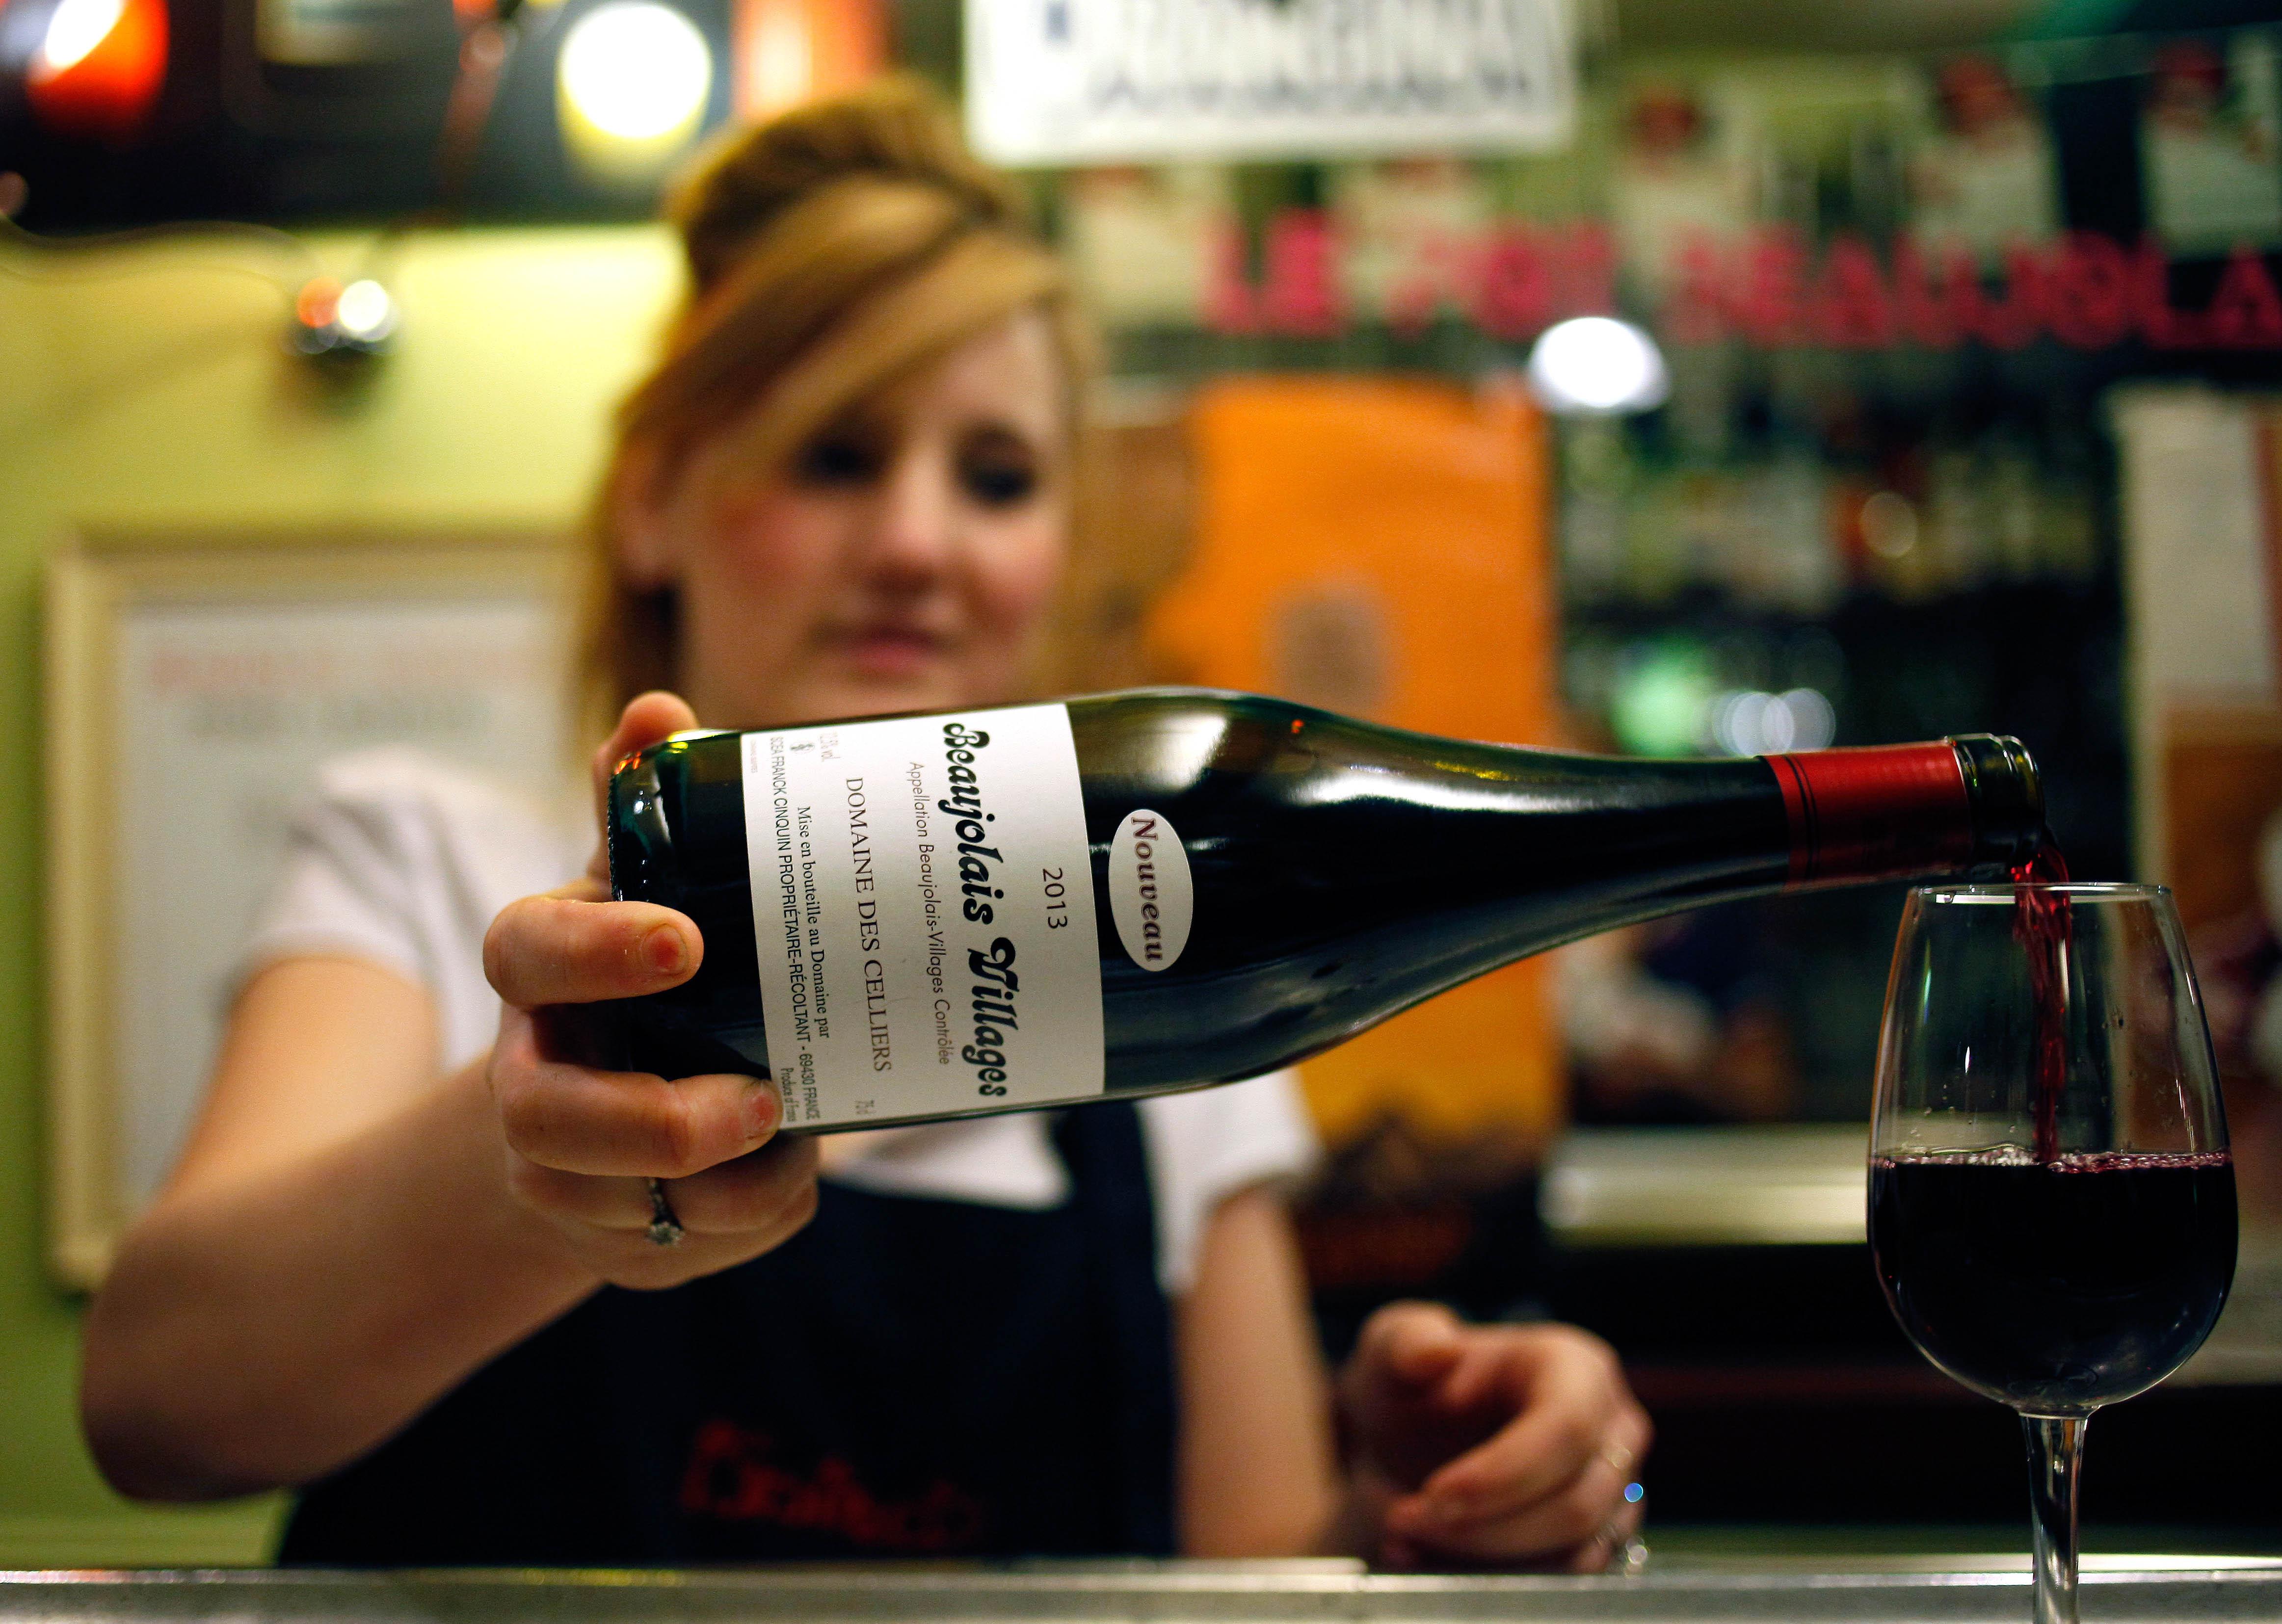 Wine of the Week: Wine pairings and deals for Restaurant Week